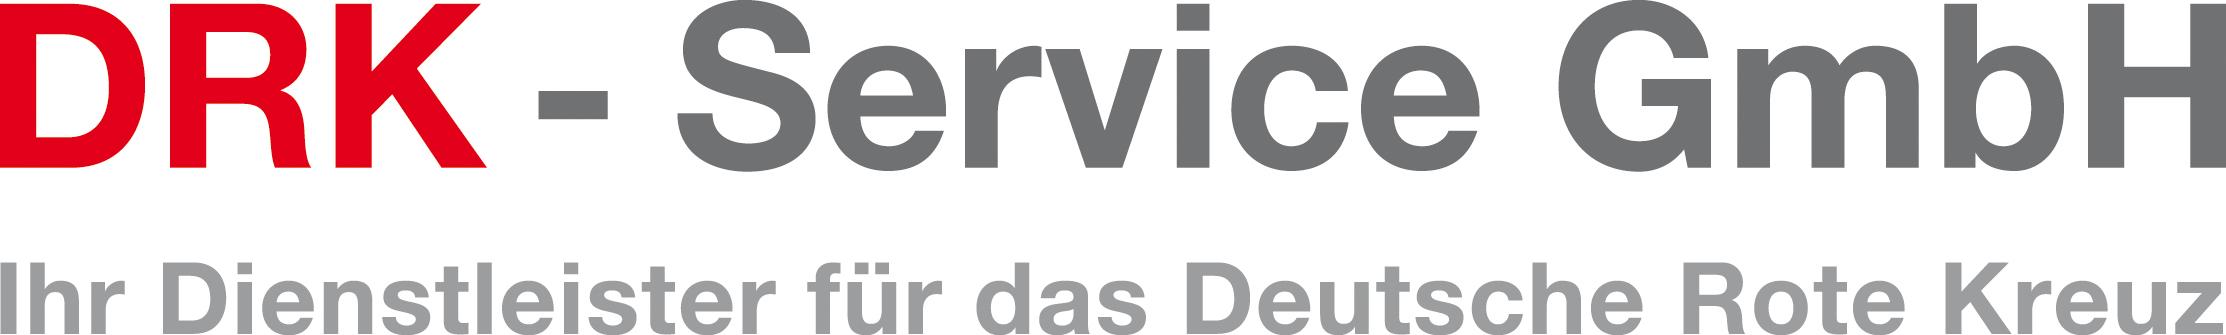 DRK-Service